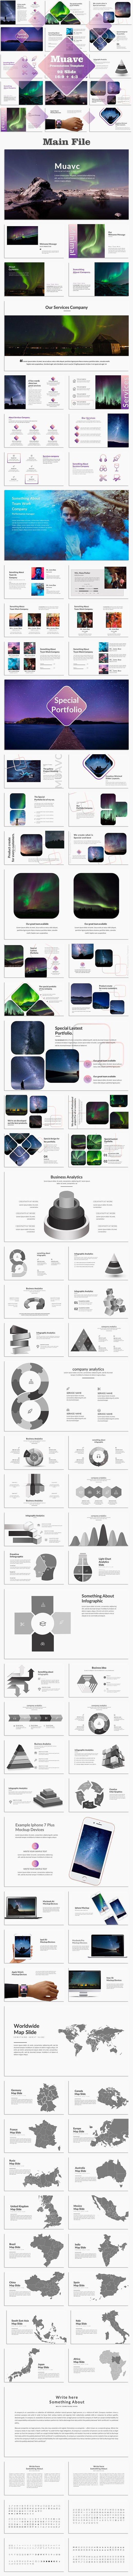 Muavc #Minimal Google Slide Template - #Google Slides #Presentation Templates Download here:  https://graphicriver.net/item/muavc-minimal-google-slide-template/20342221?ref=alena994